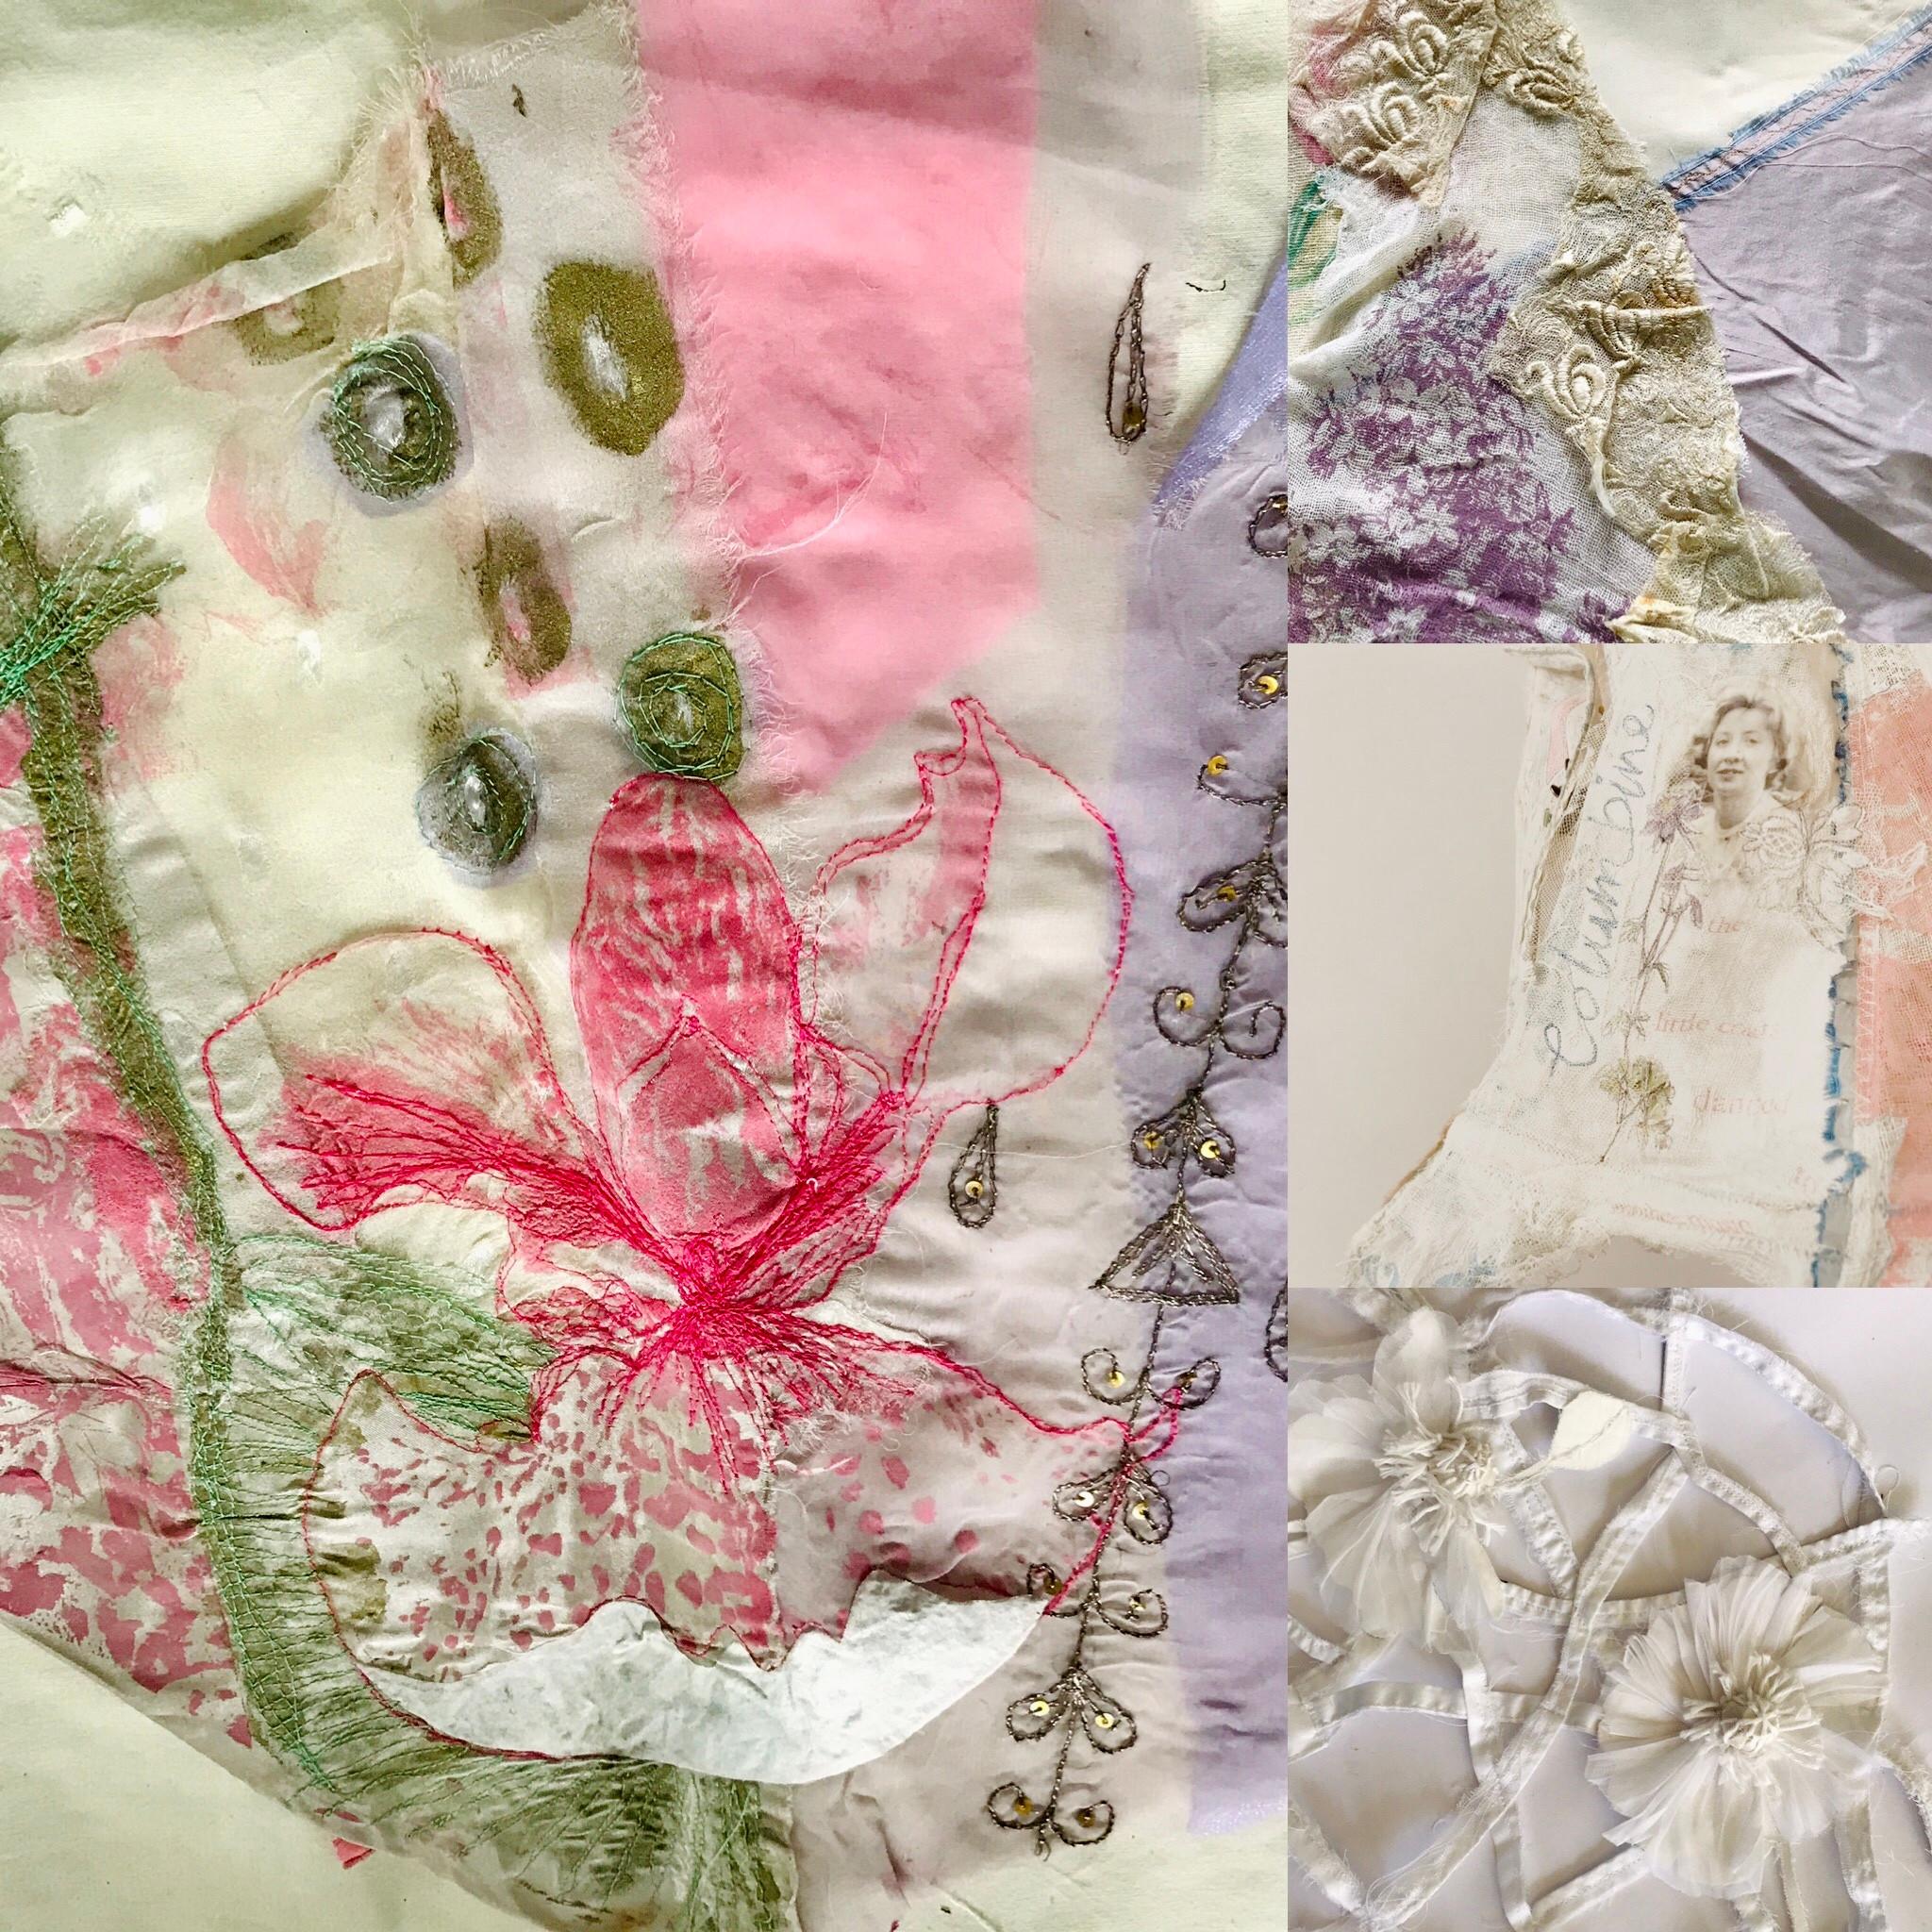 Art Textile 3- De-construct /Reconstruct